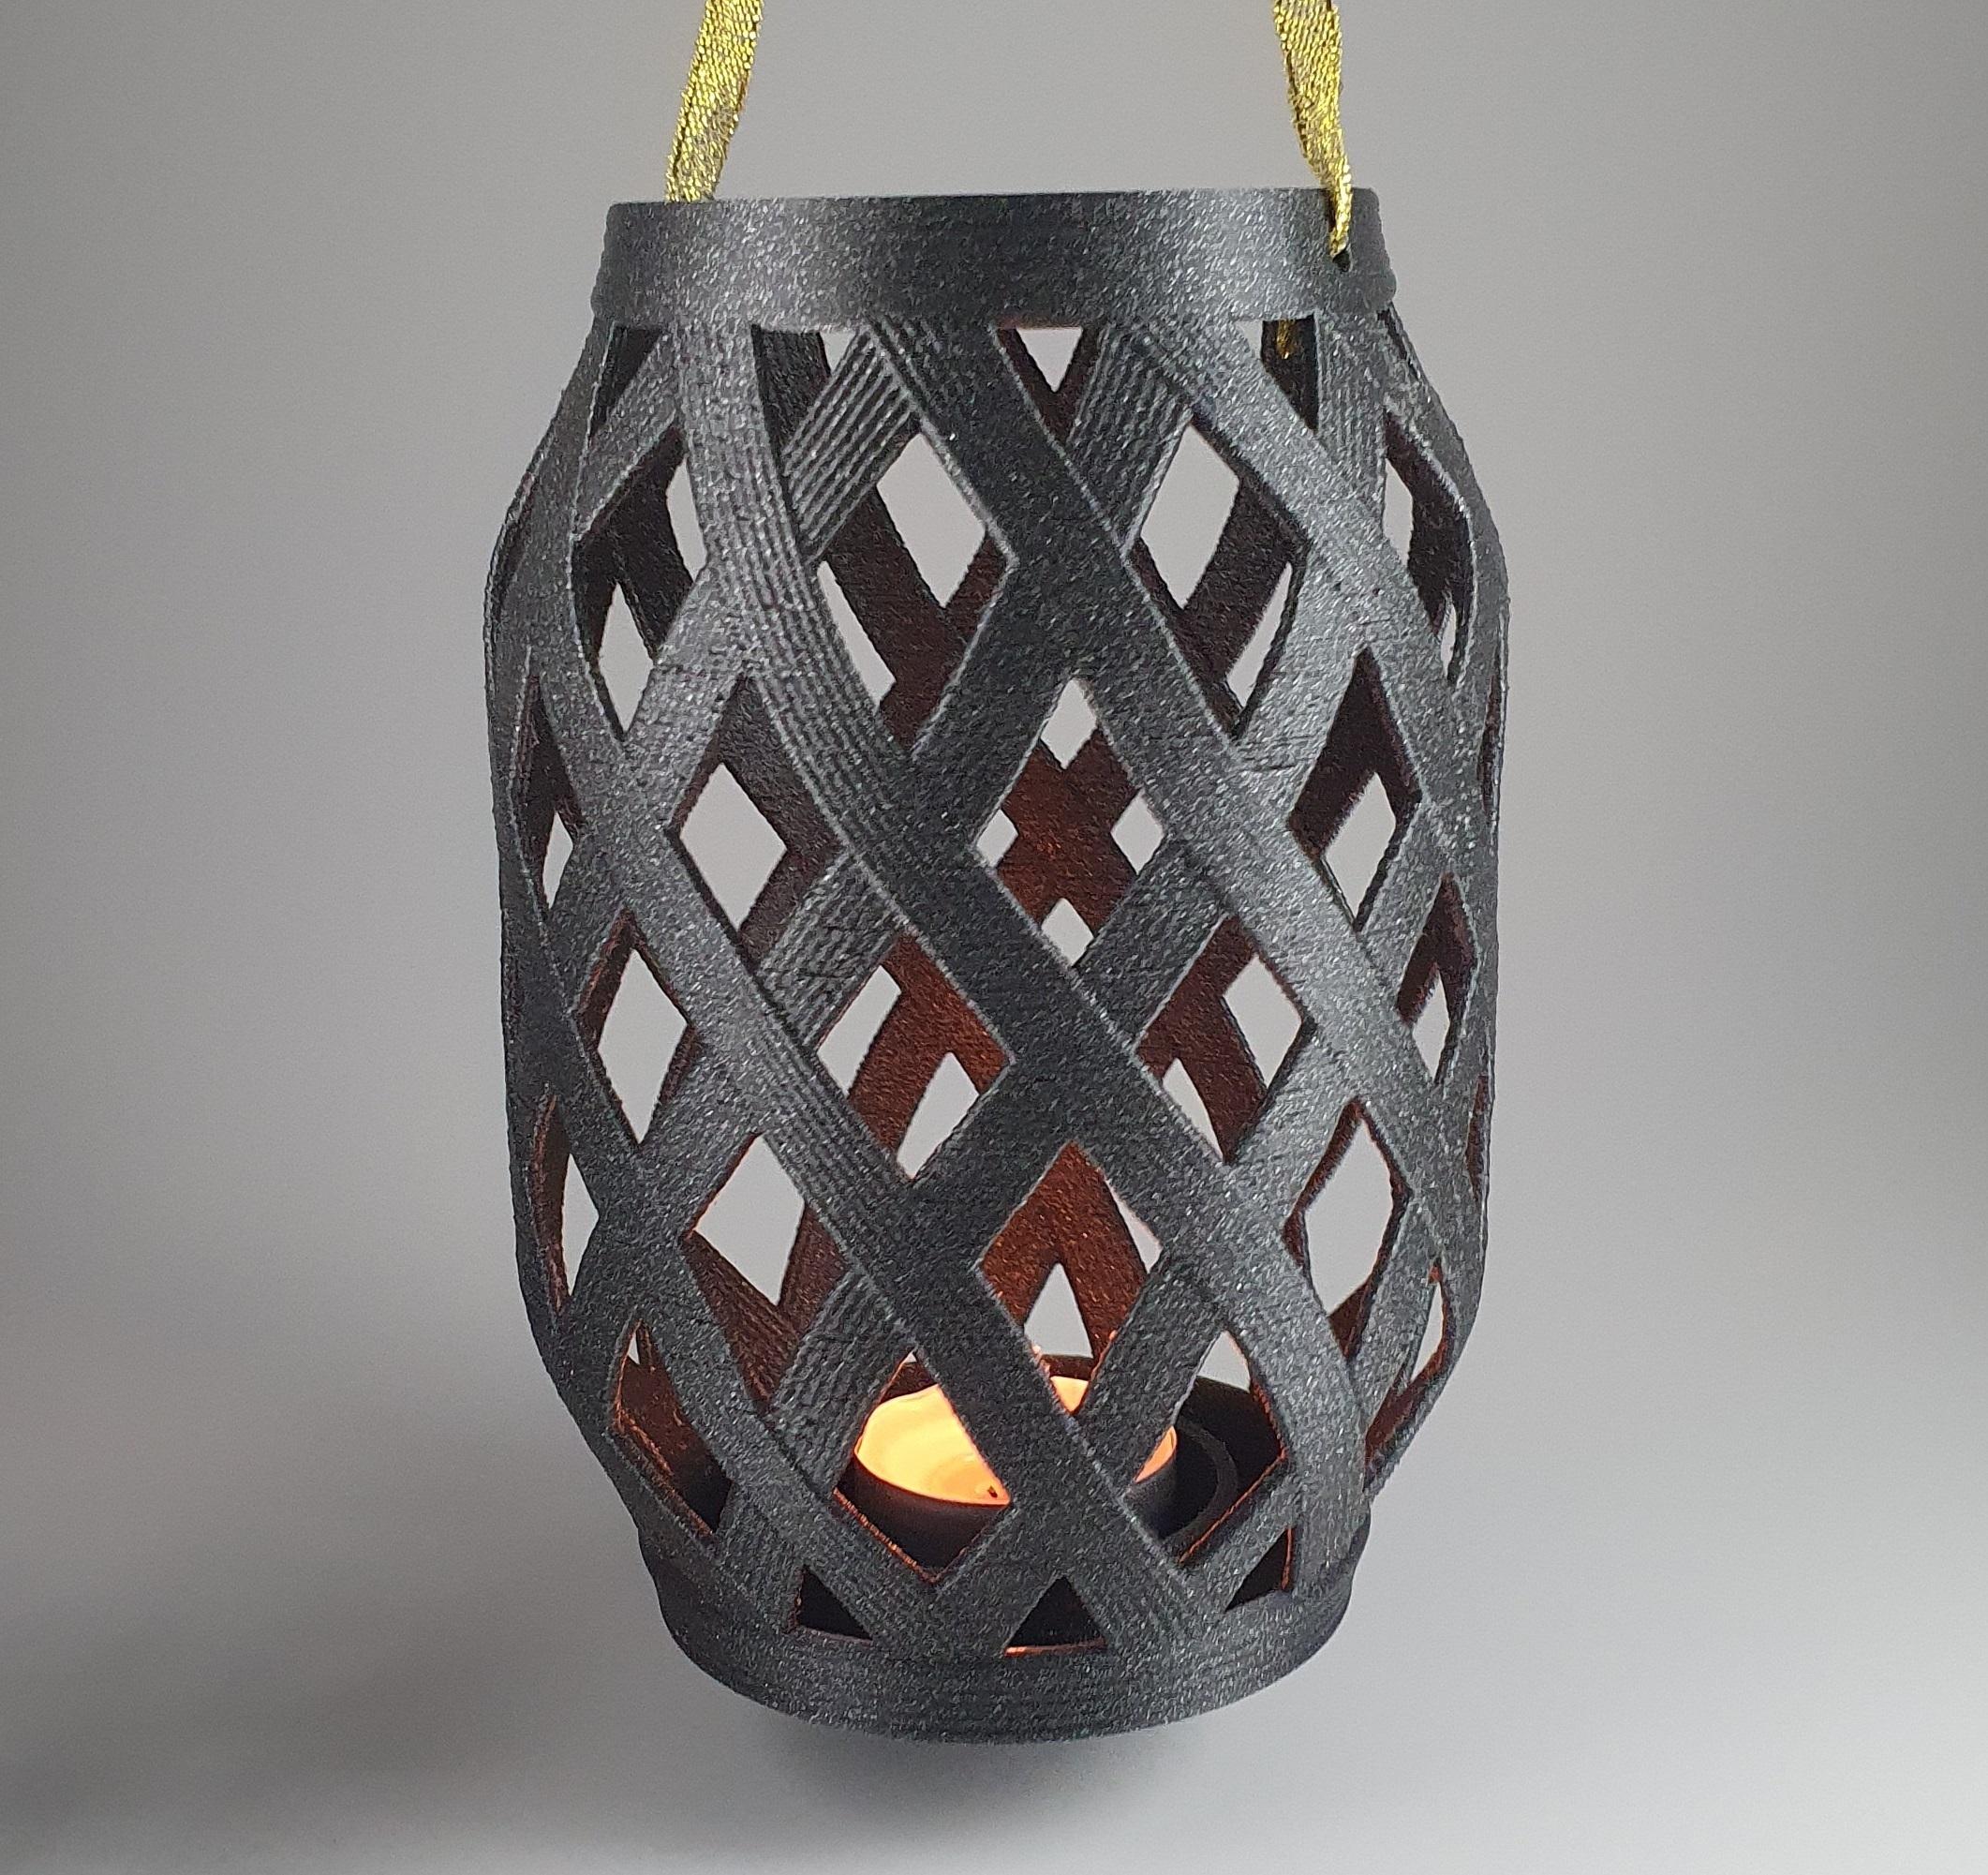 4.jpg Download free STL file Candle Lantern  • 3D printer template, 3D_Printing_Athens